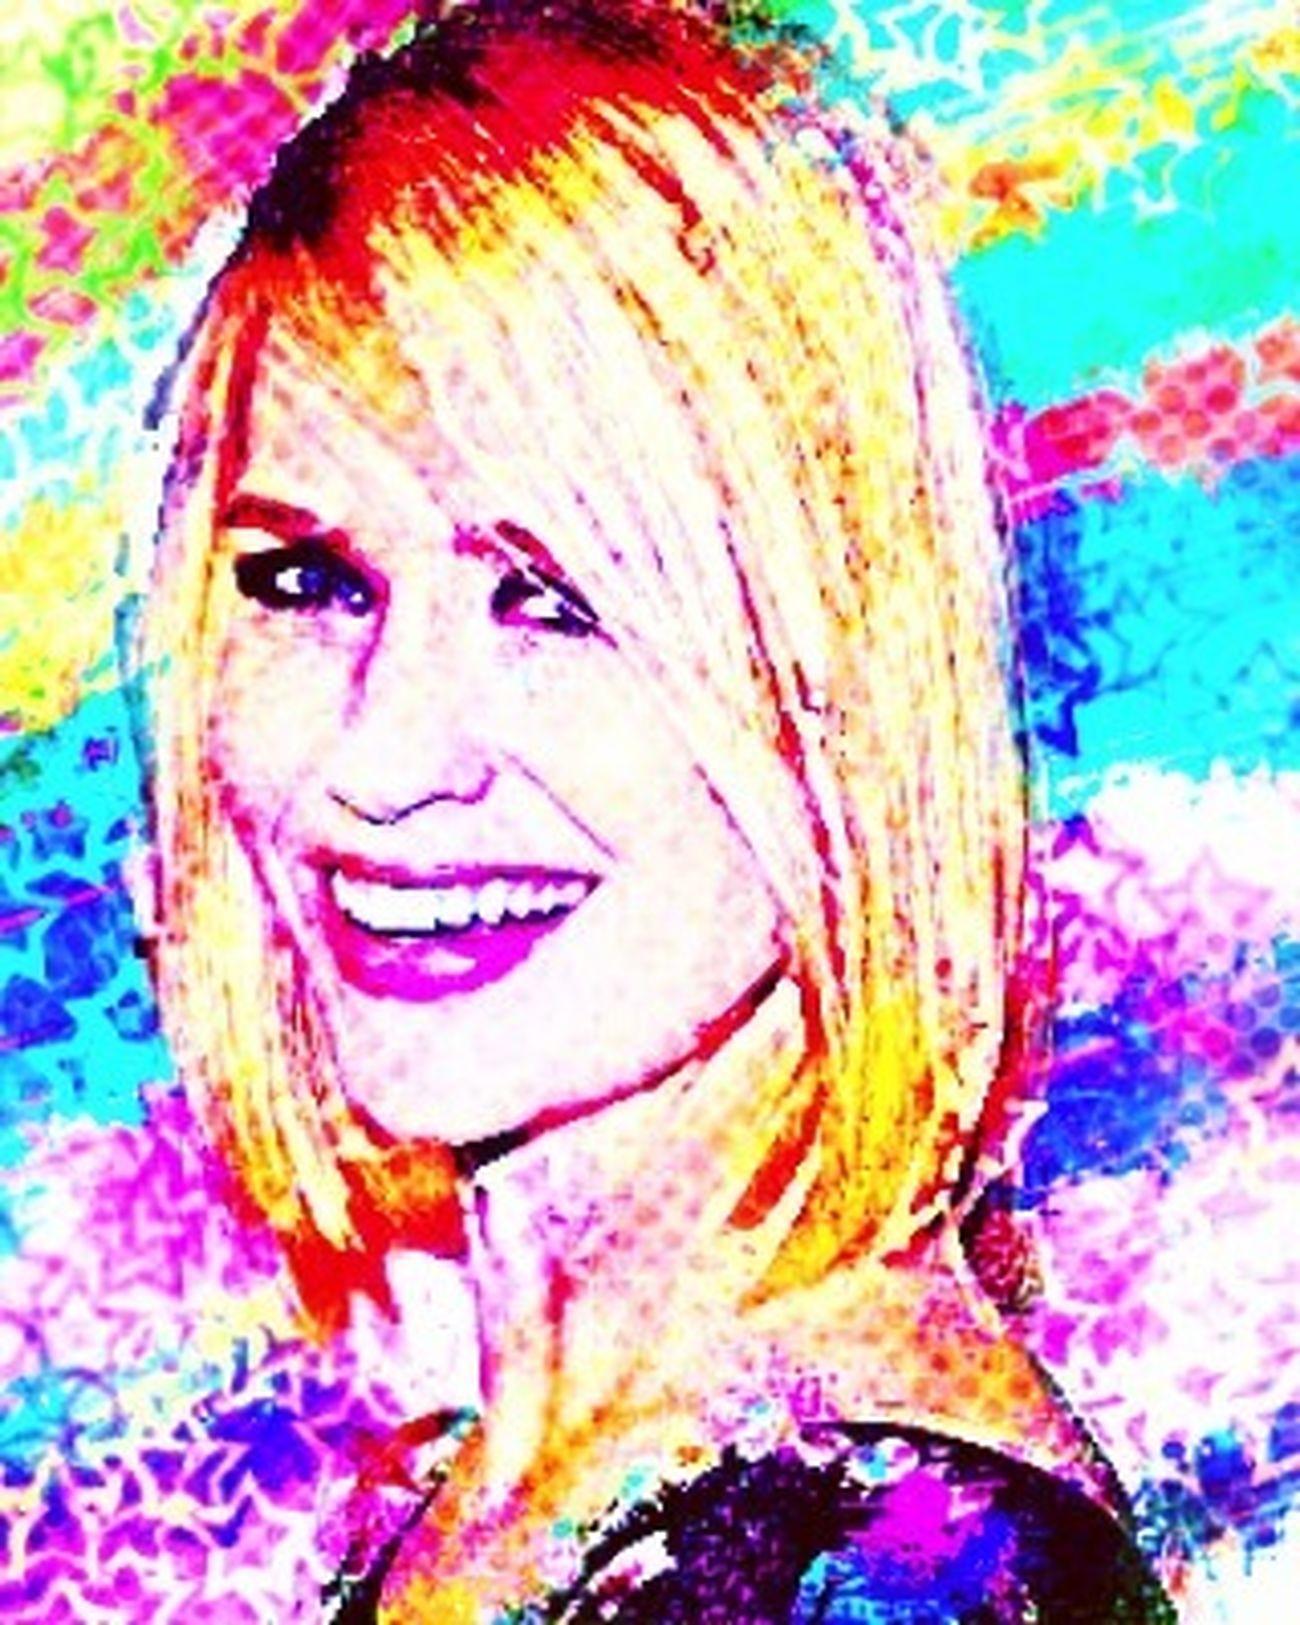 Digitalpainting Gadsphotopainting GPP Adobephotoshop Design Art Karya Anakikutikutan Fotograferjomblo Anaksoksibuk